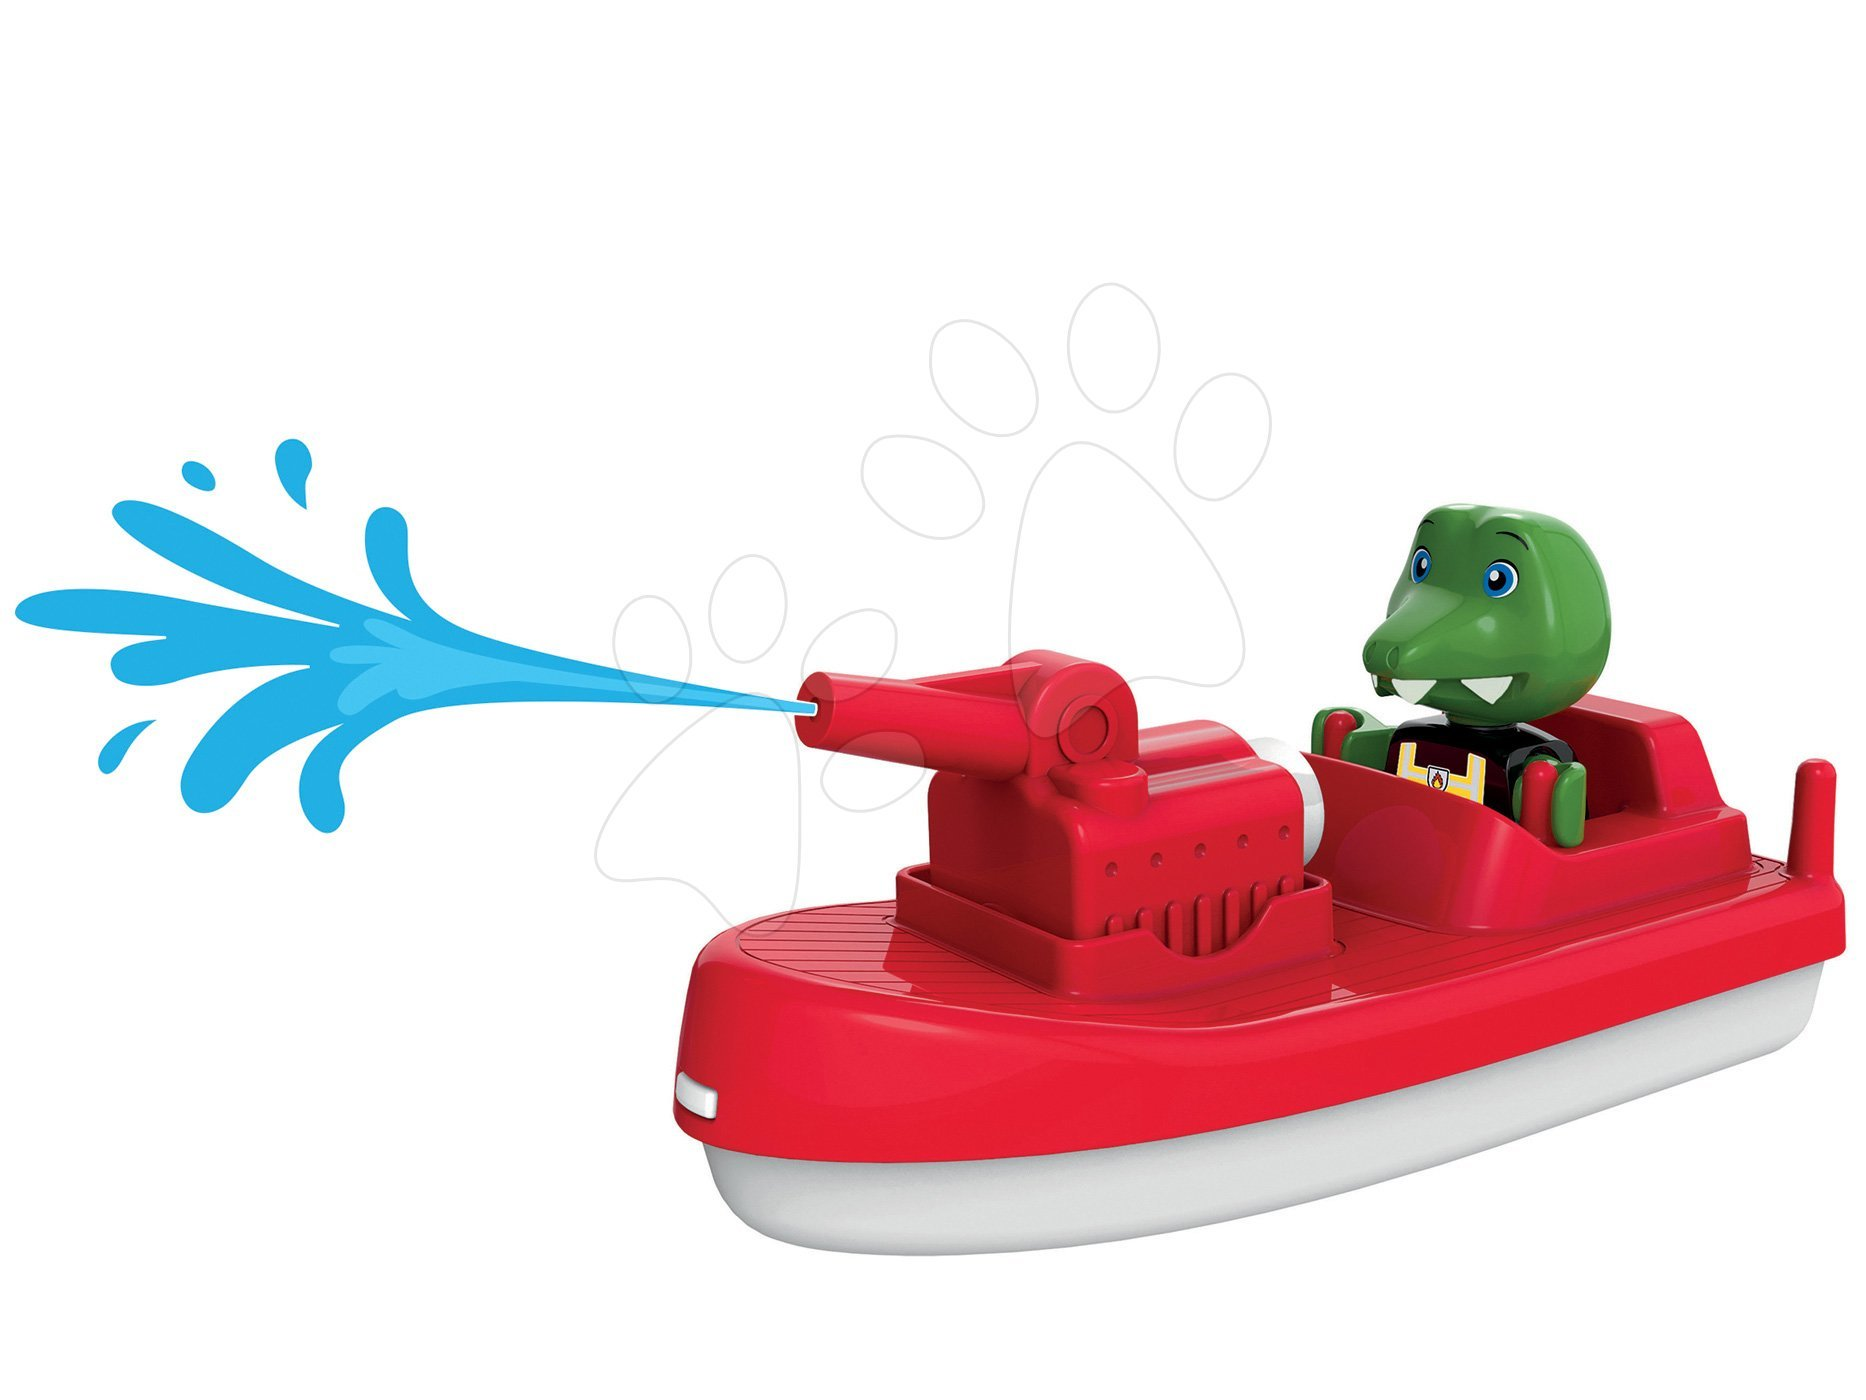 Brod s vodenim topom Fireboat Aquaplay s dometom od 10 metara i kapetanom krokodilom Nilsom (kompatibilan s Duplom)